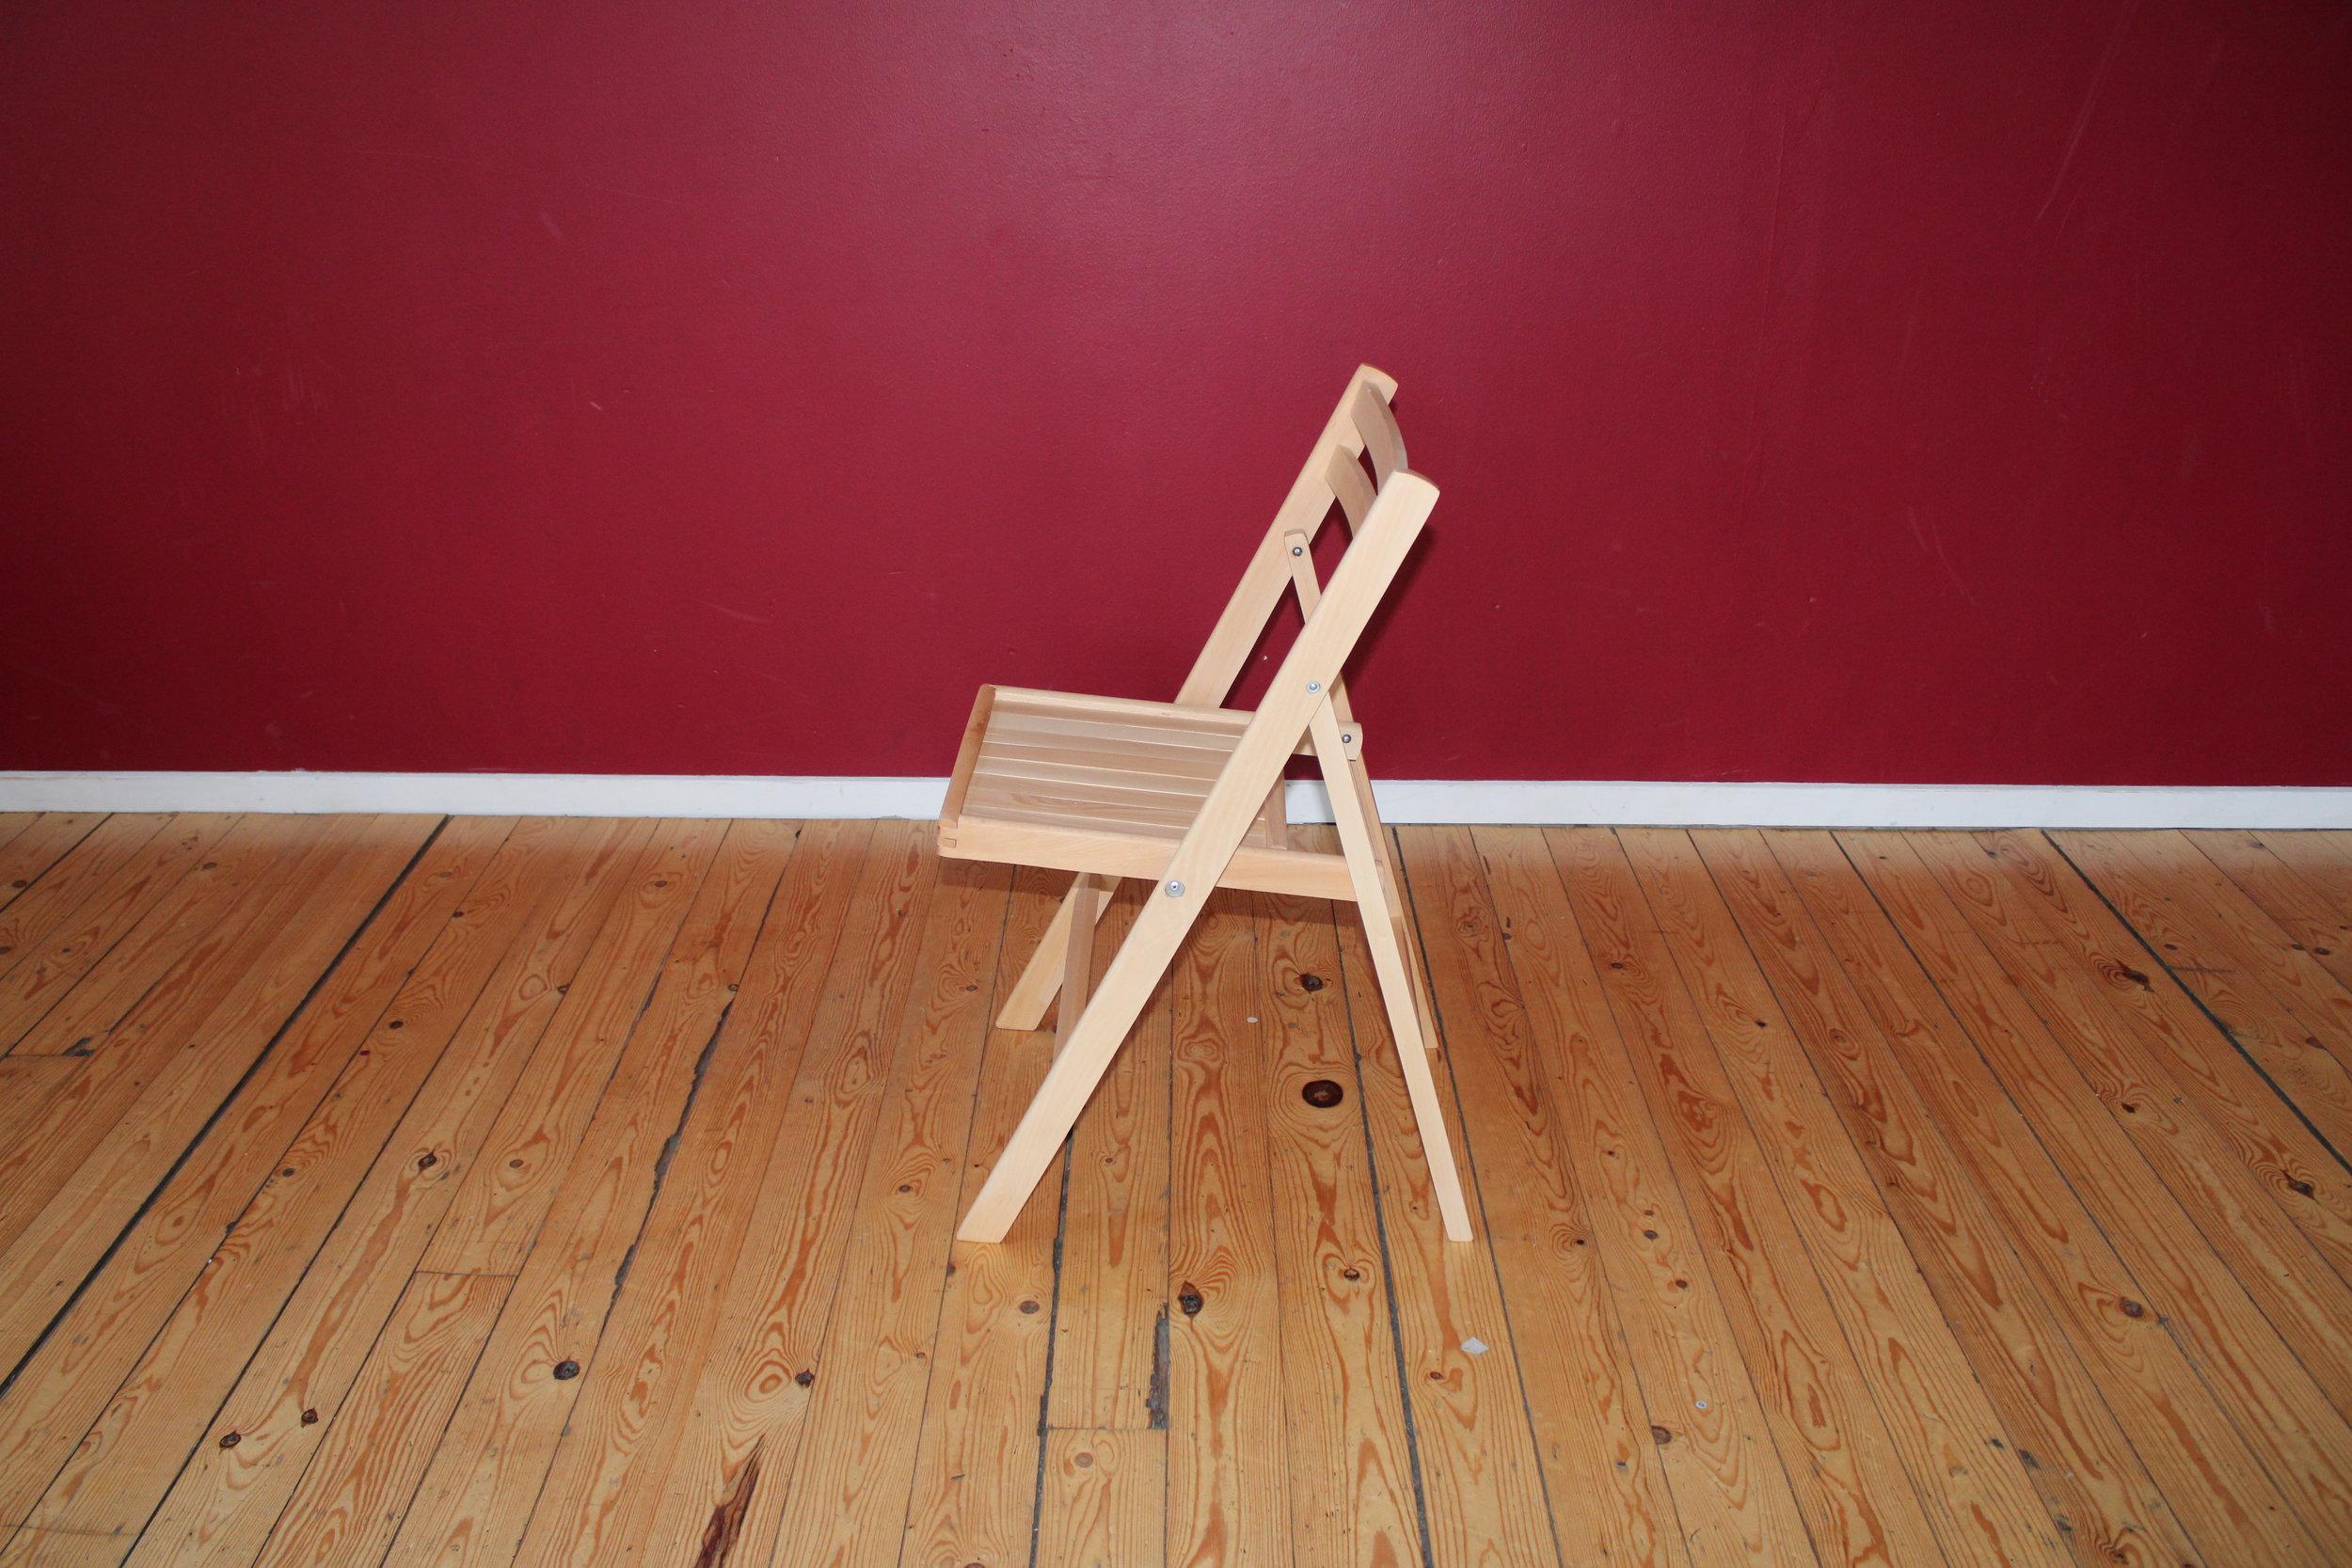 Træ klapstole.JPG